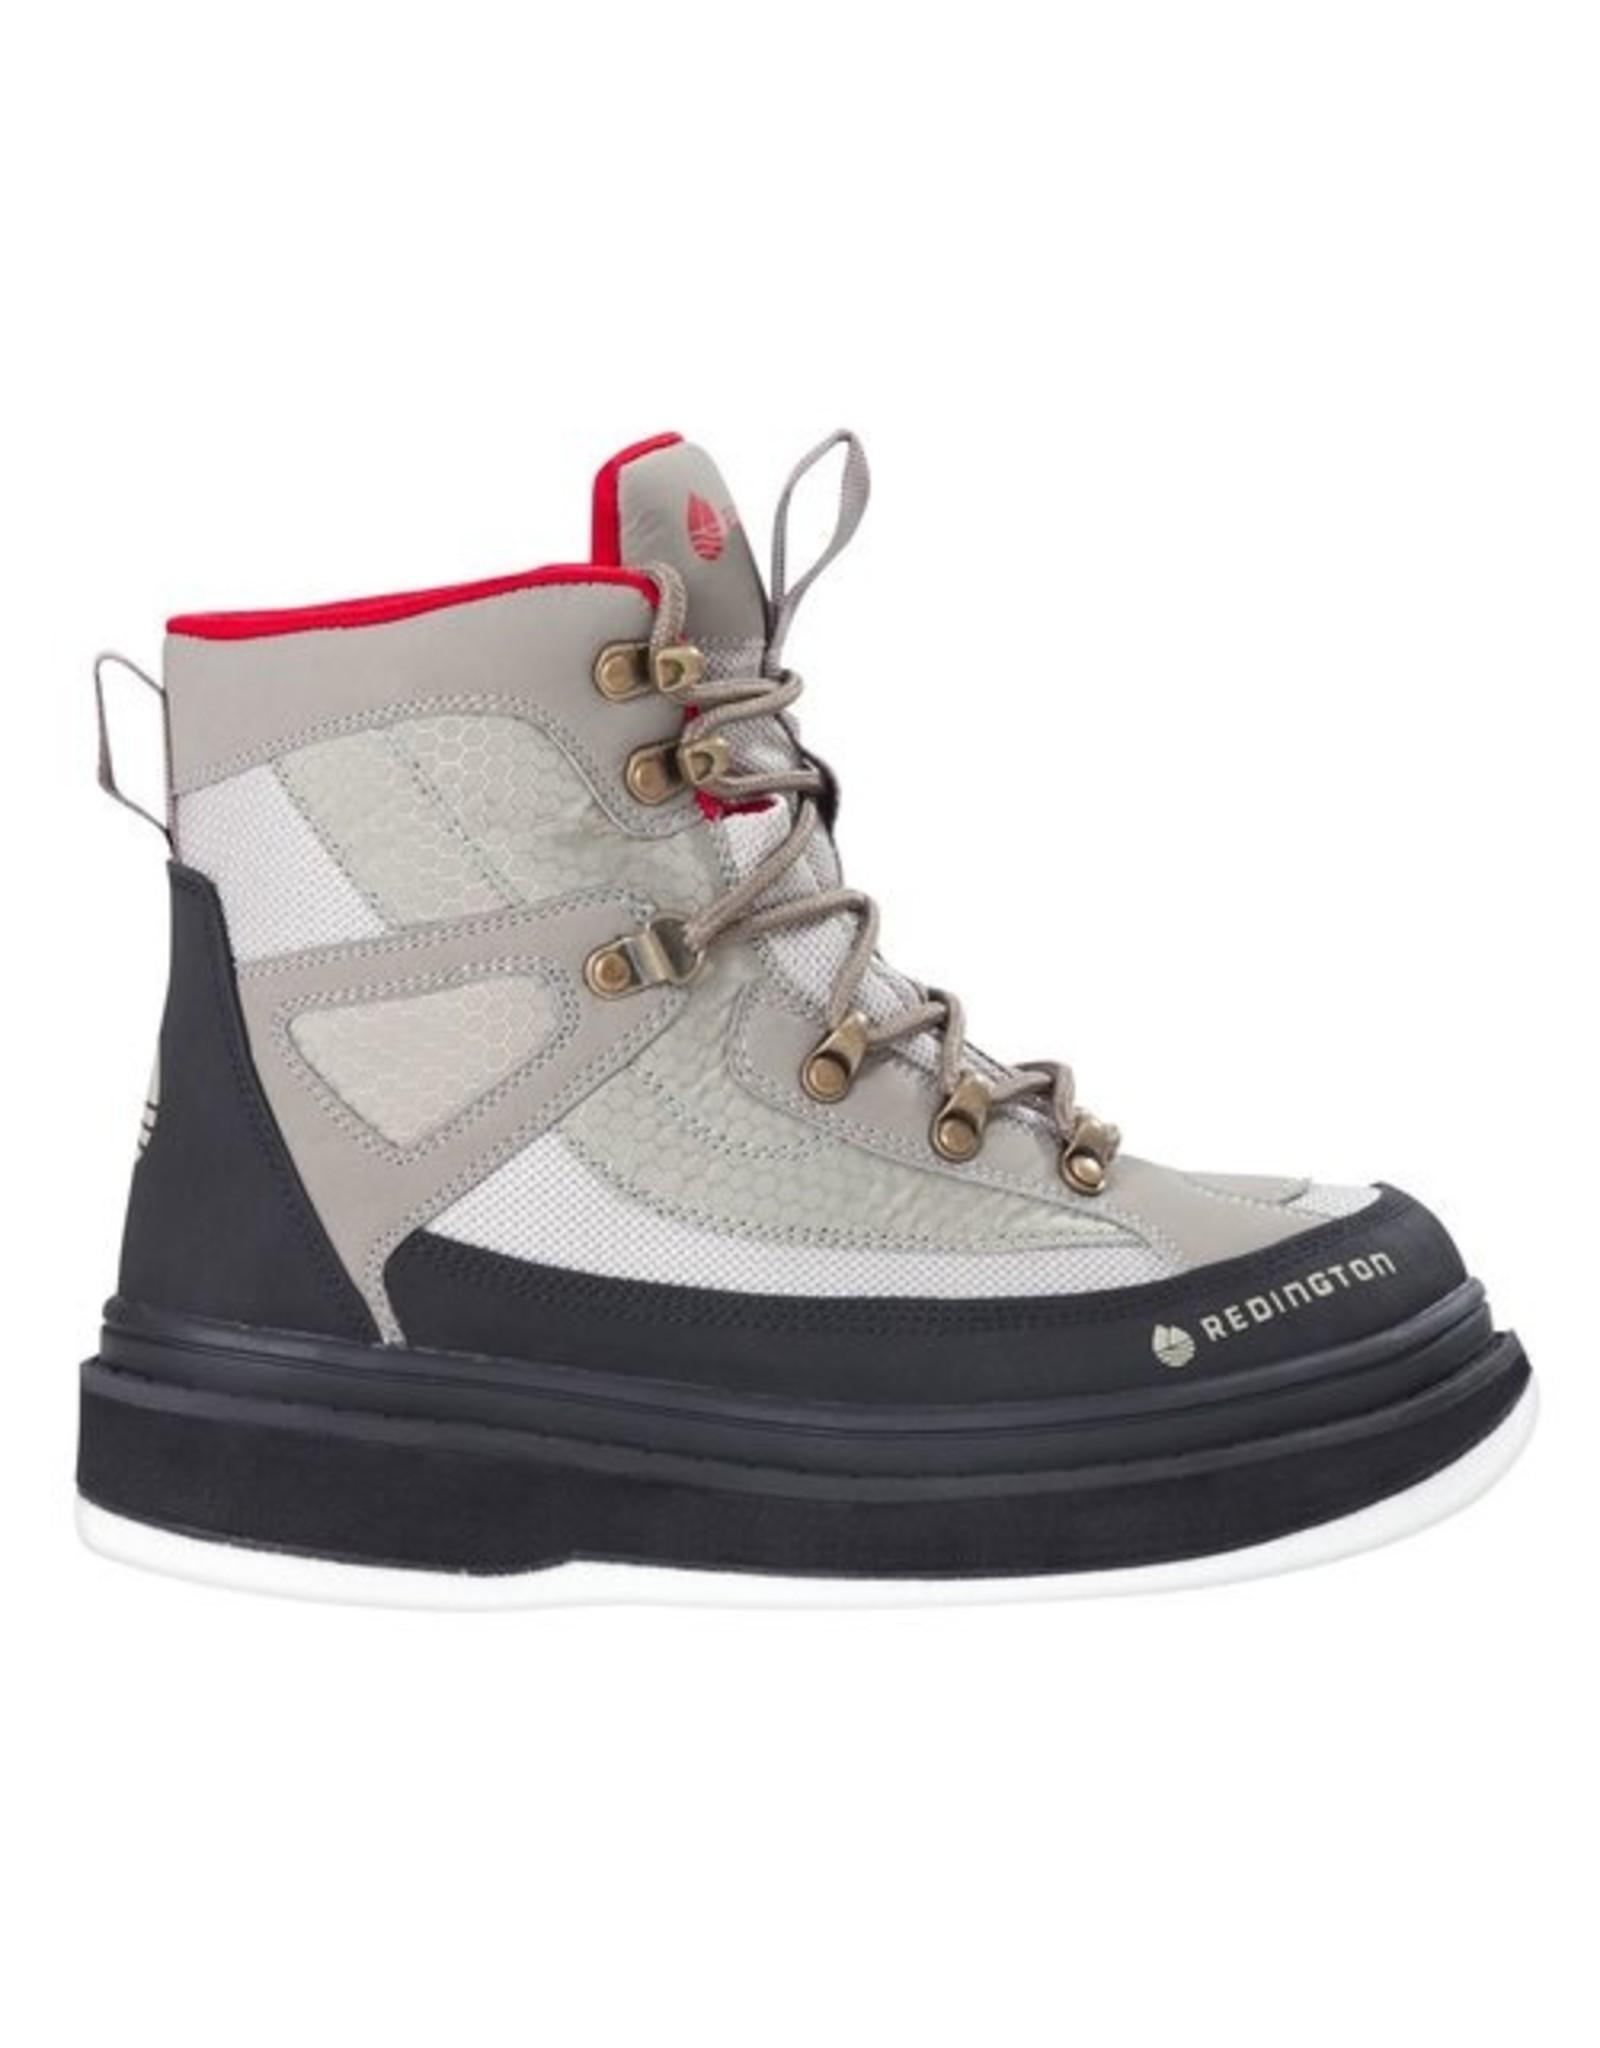 Redington Redington - Women's Willow River Wading Boot - Felt Sole